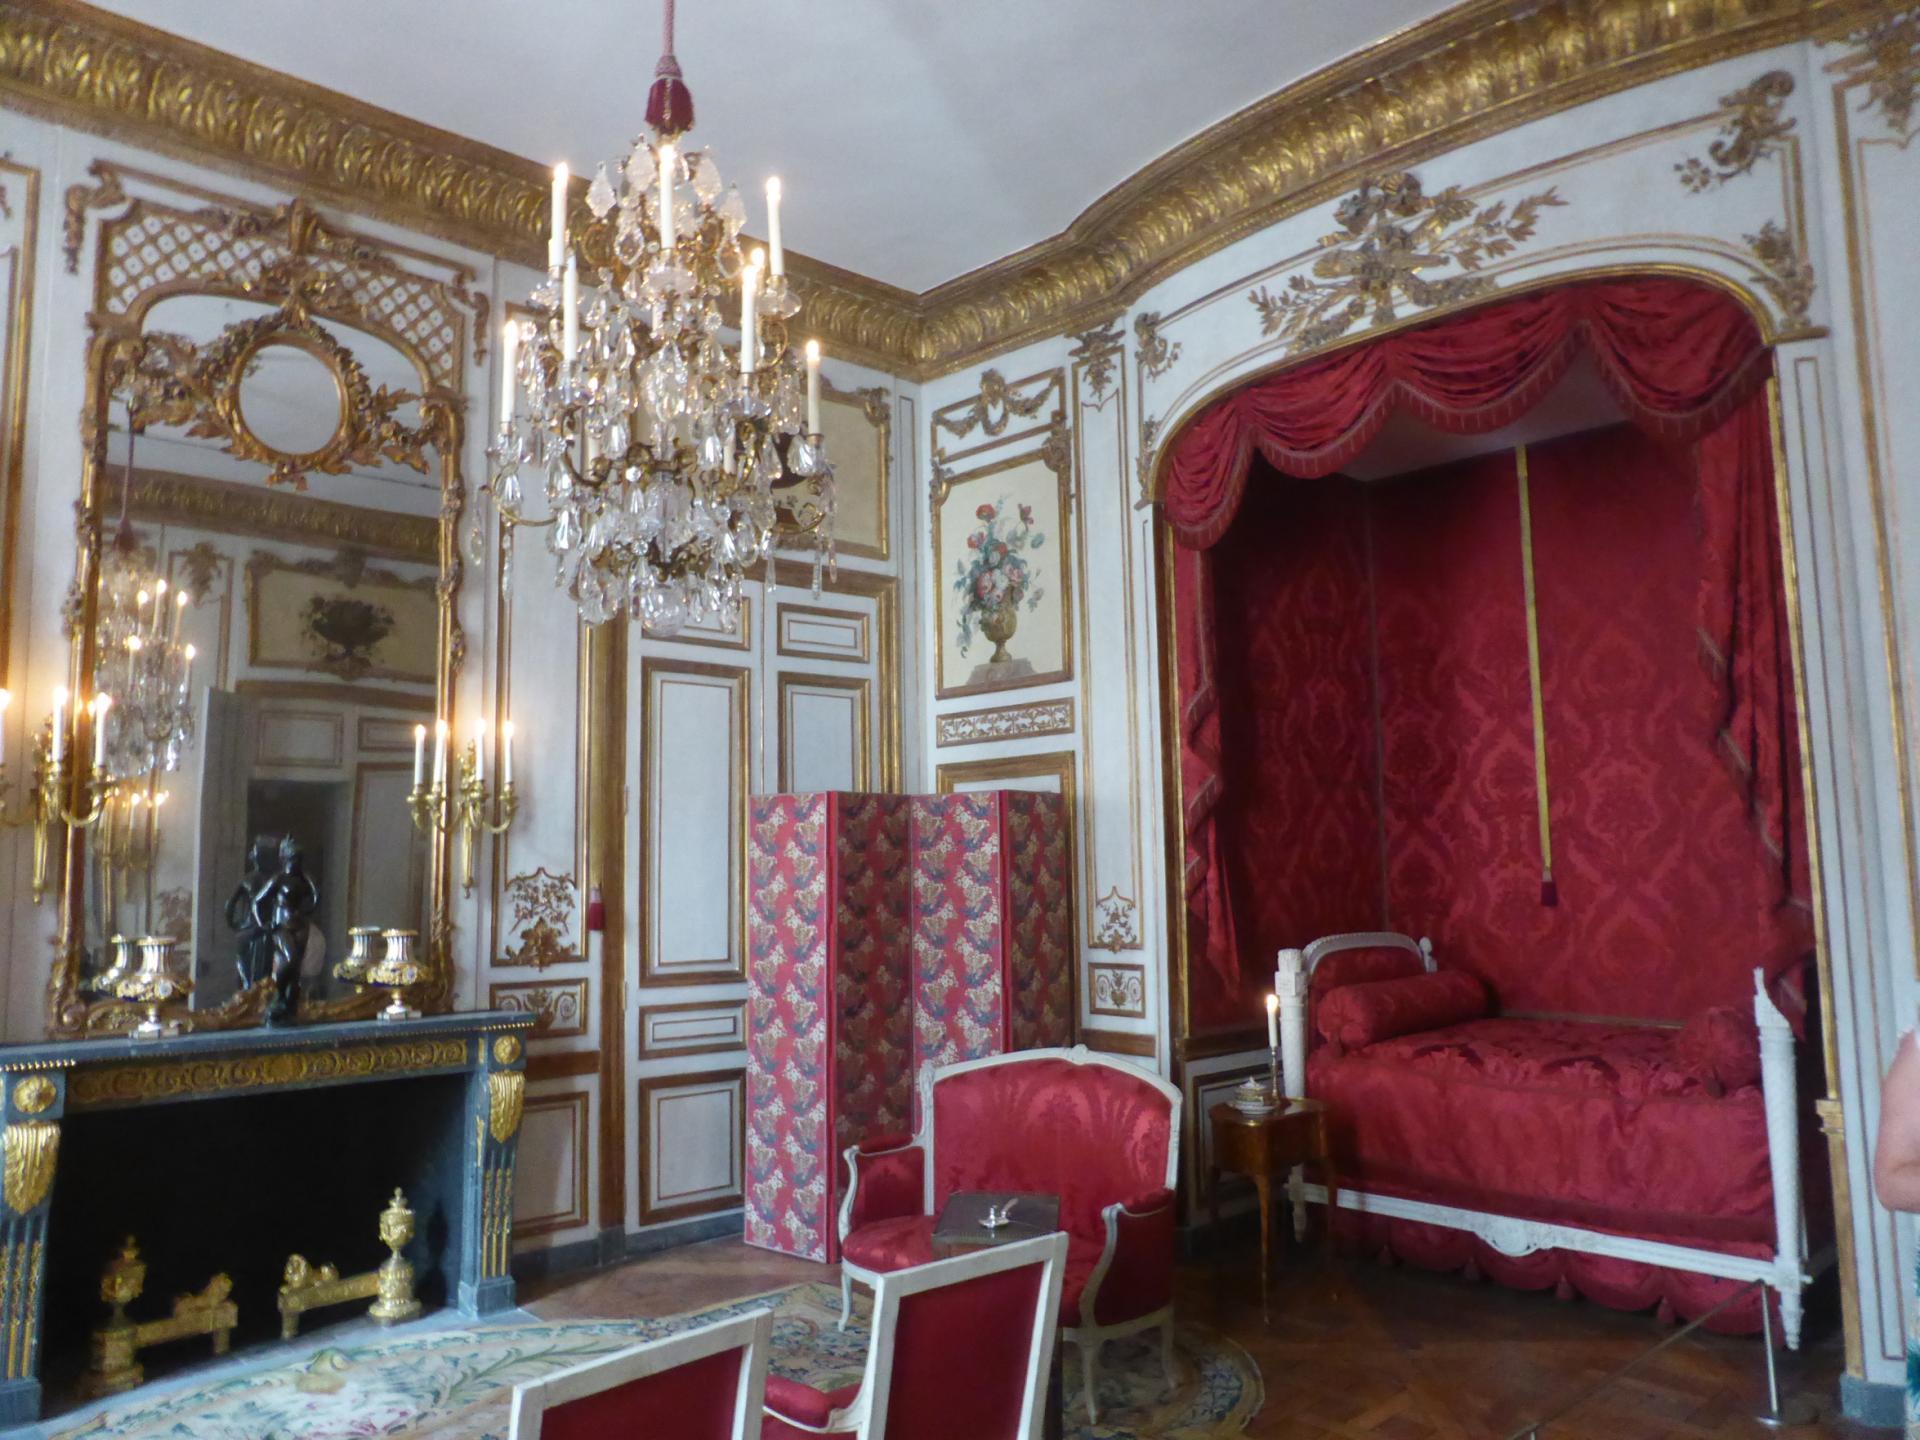 Chambre de M. de Fontanieu, cl. Ph. Cachau